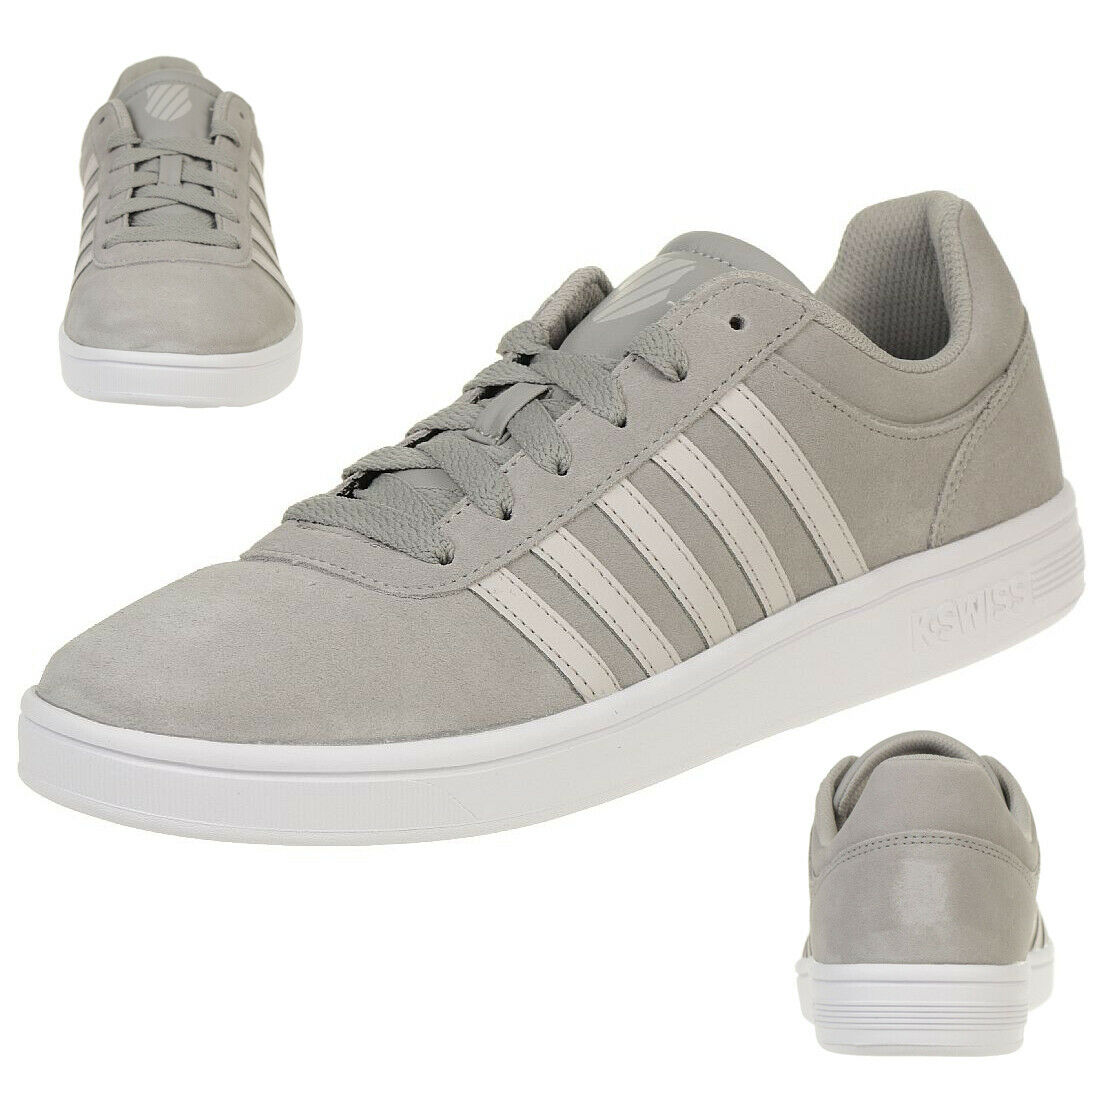 K-Swiss Court Cheswick Sde Chaussures paniers gris 05676-079-m